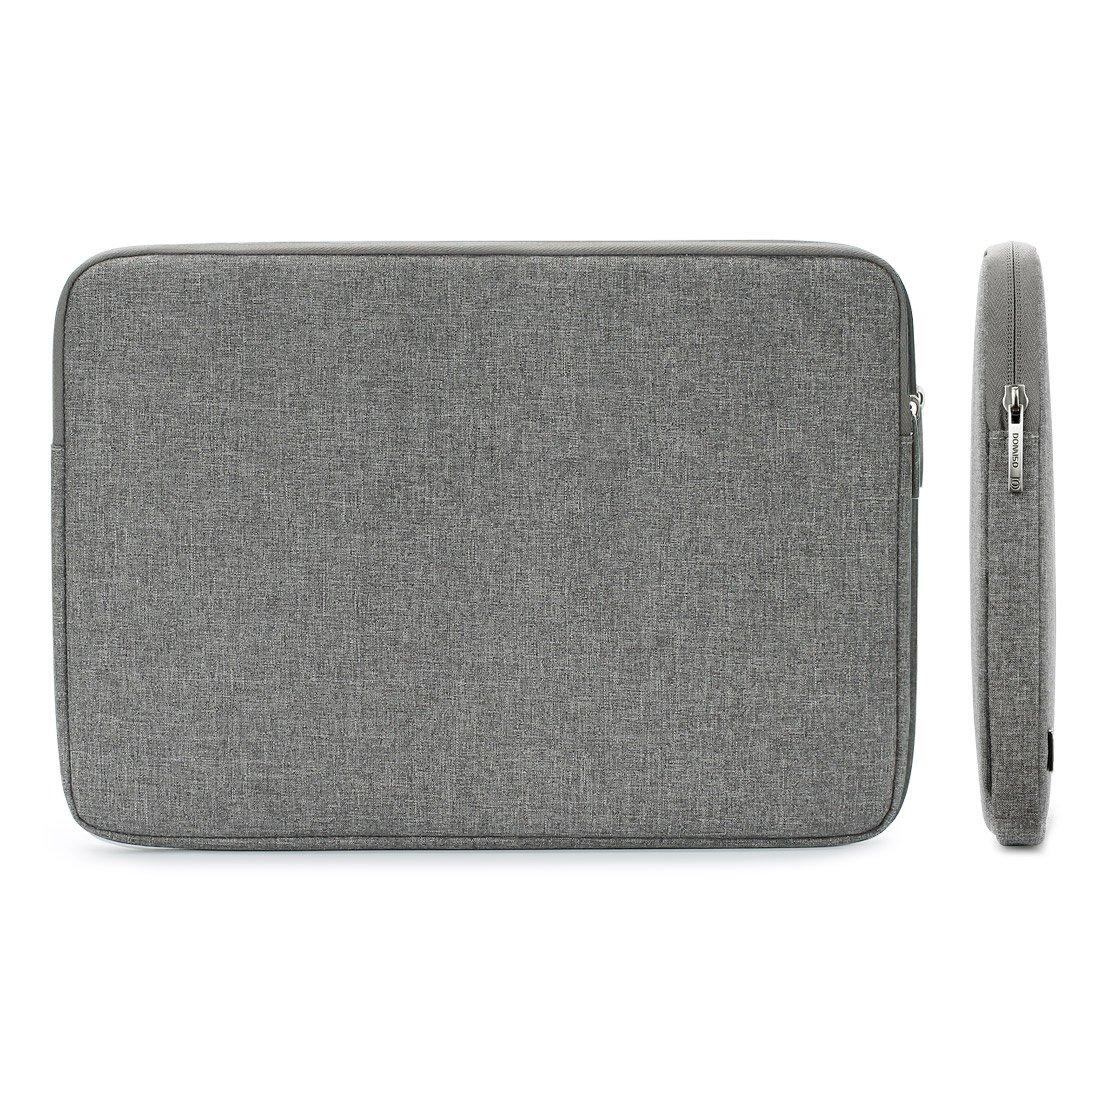 13 MacBook Air 12.5 Computers Dark Grey DOMISO 12.5 Inch Water-Resistant Laptop Sleeve Notebook Carrying Case Bag for 13 MacBook Pro Retina Display 12.9 iPad Pro